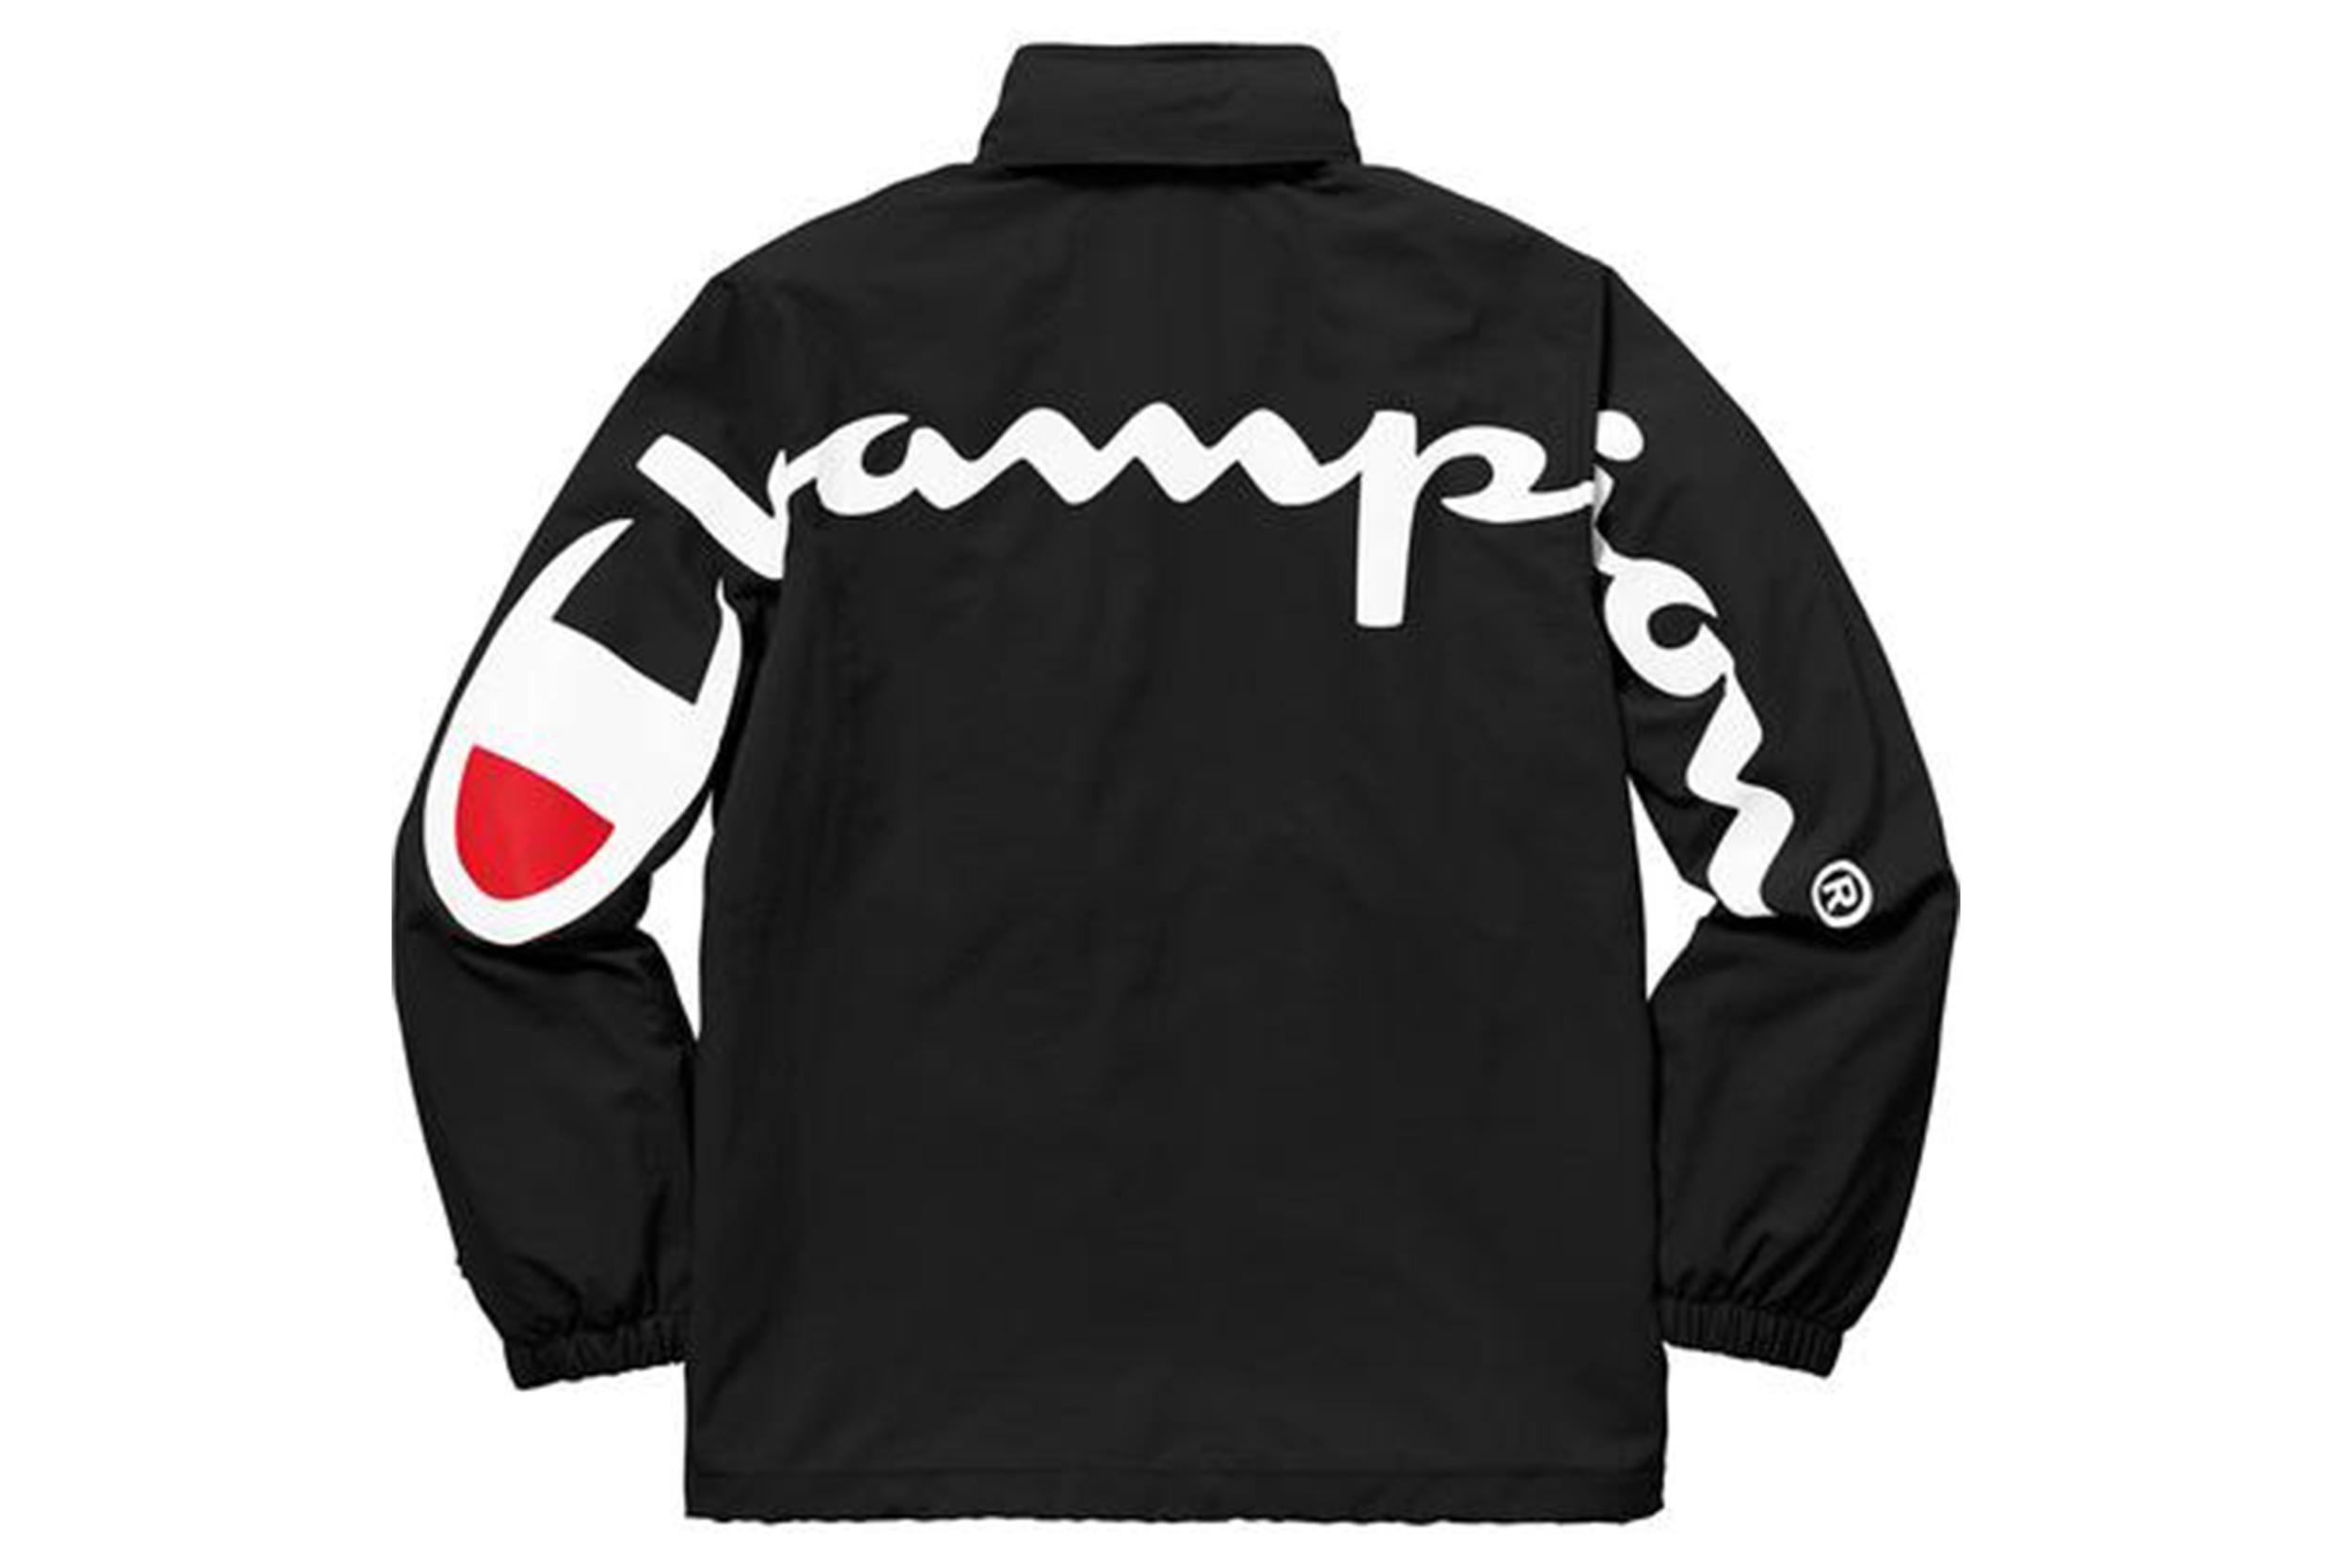 eacdaeac62d Supreme Champion Track Jacket Black — Tidy SNKRS